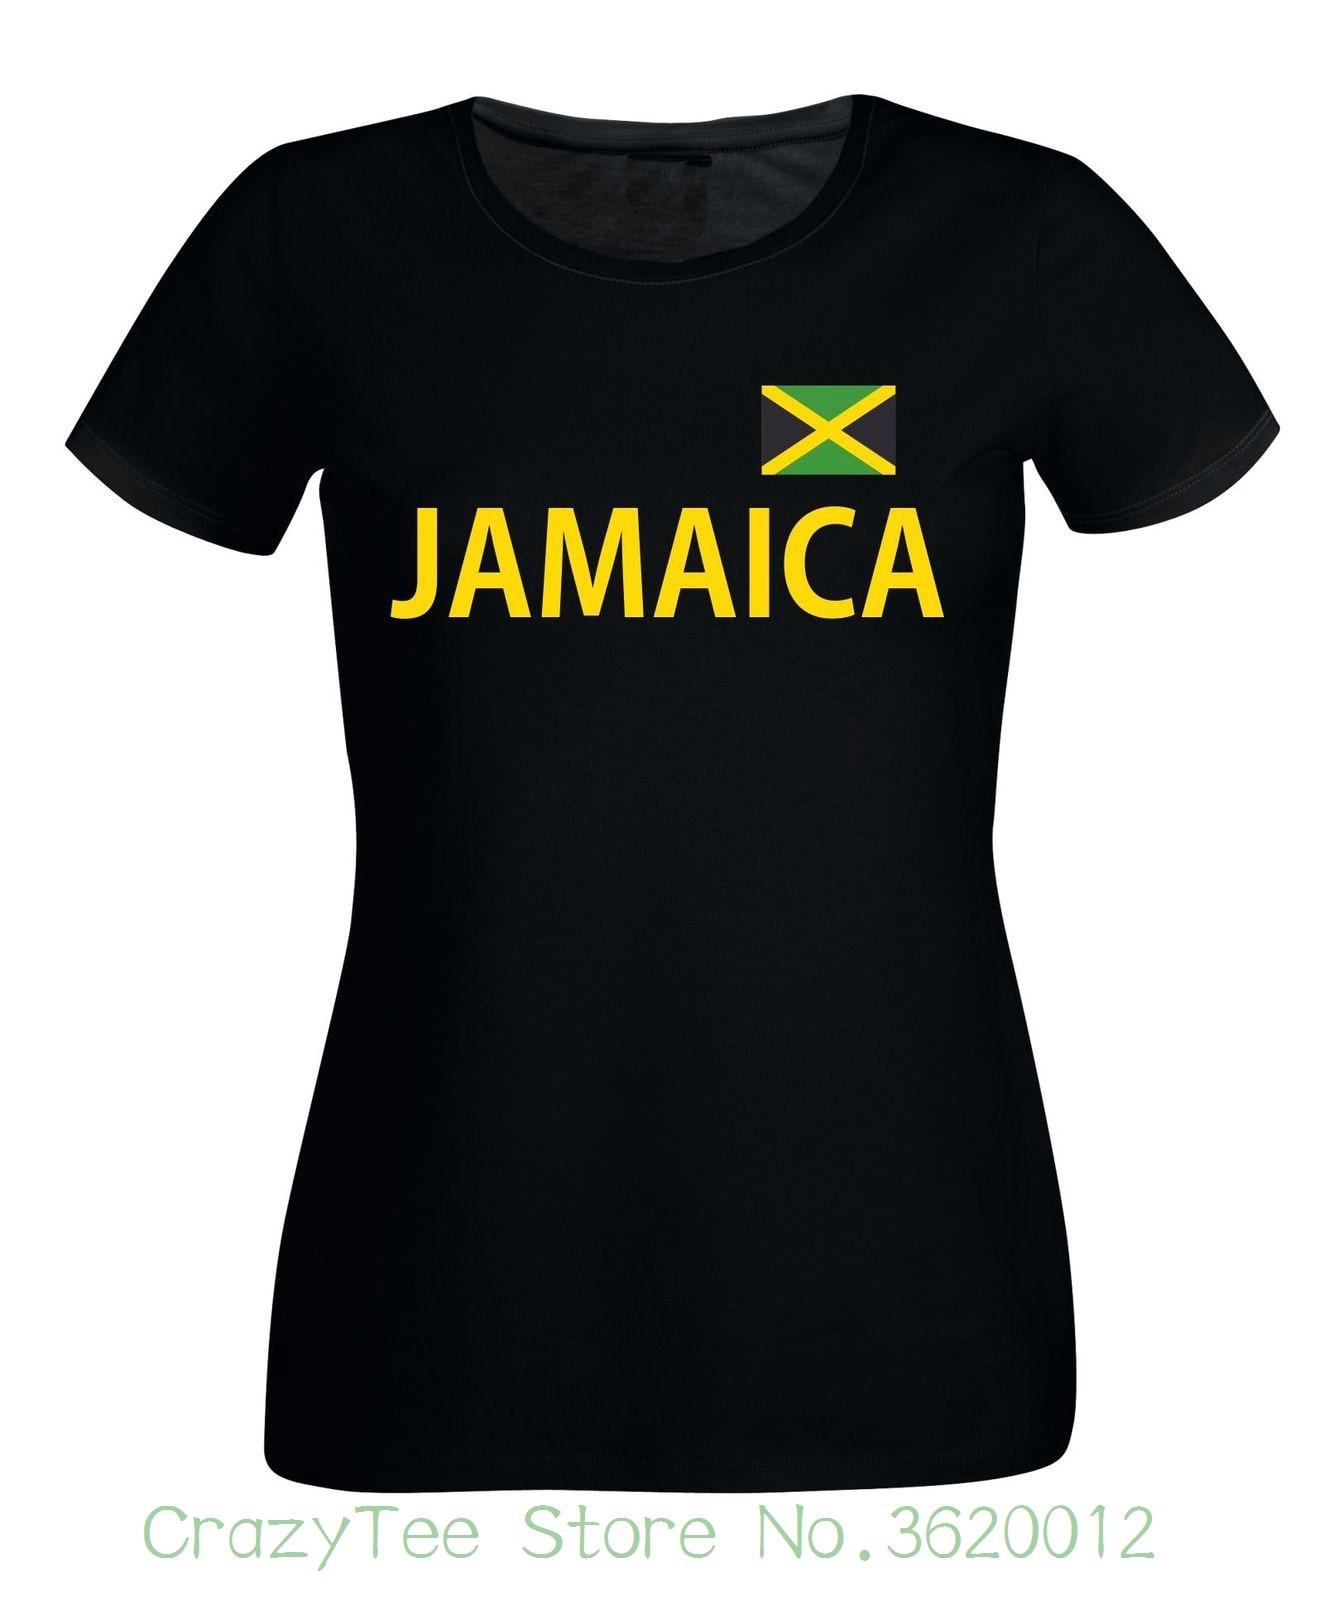 Womens Tee Jamaica Ladies T-shirt - Black Or White - S To Xl - Jamaica Holiday Caribbean Female Tshirt 2018 Summer